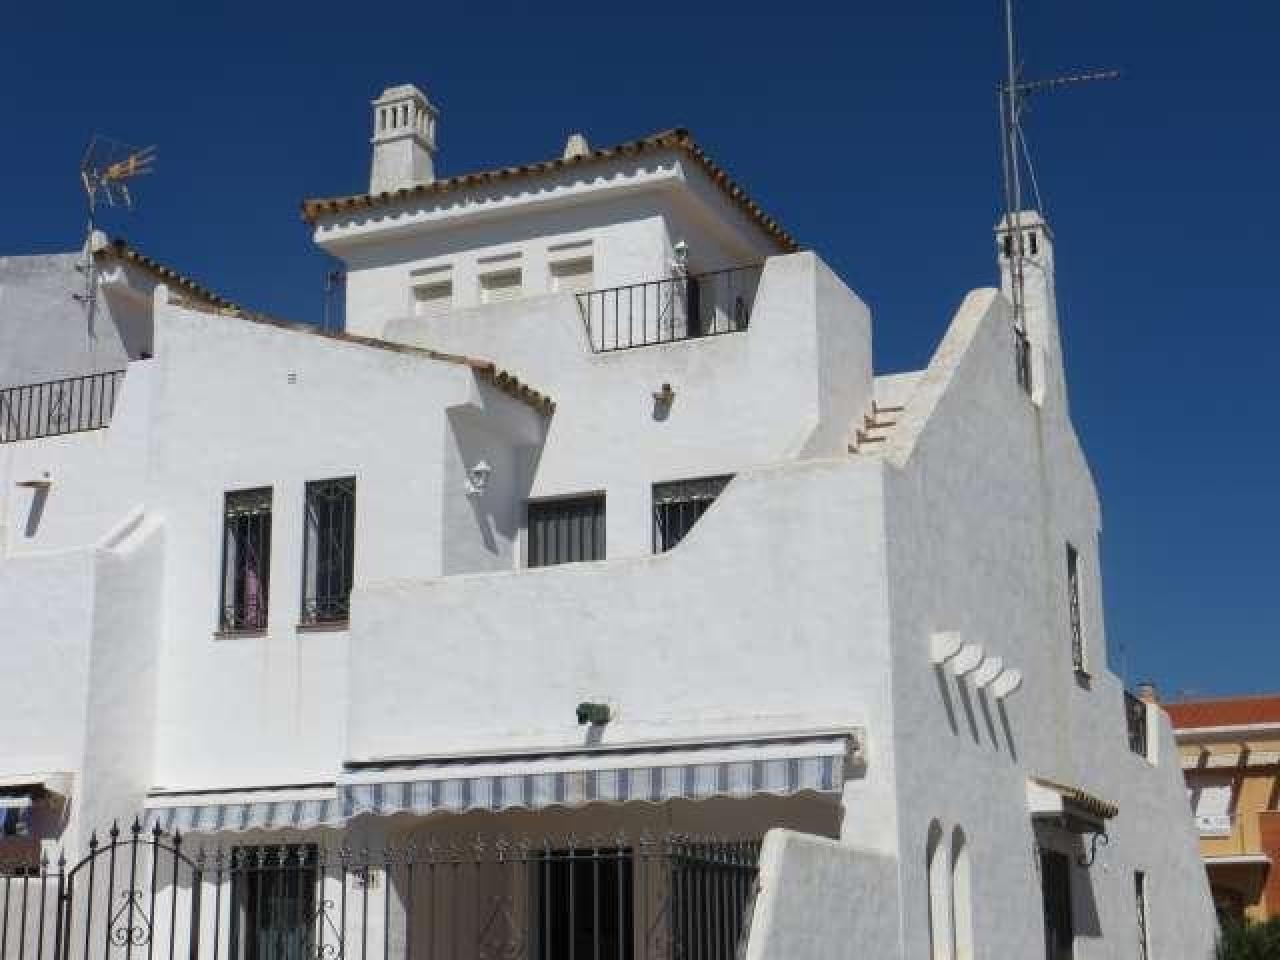 Apartamento para vacaciones Lepe, Huelva